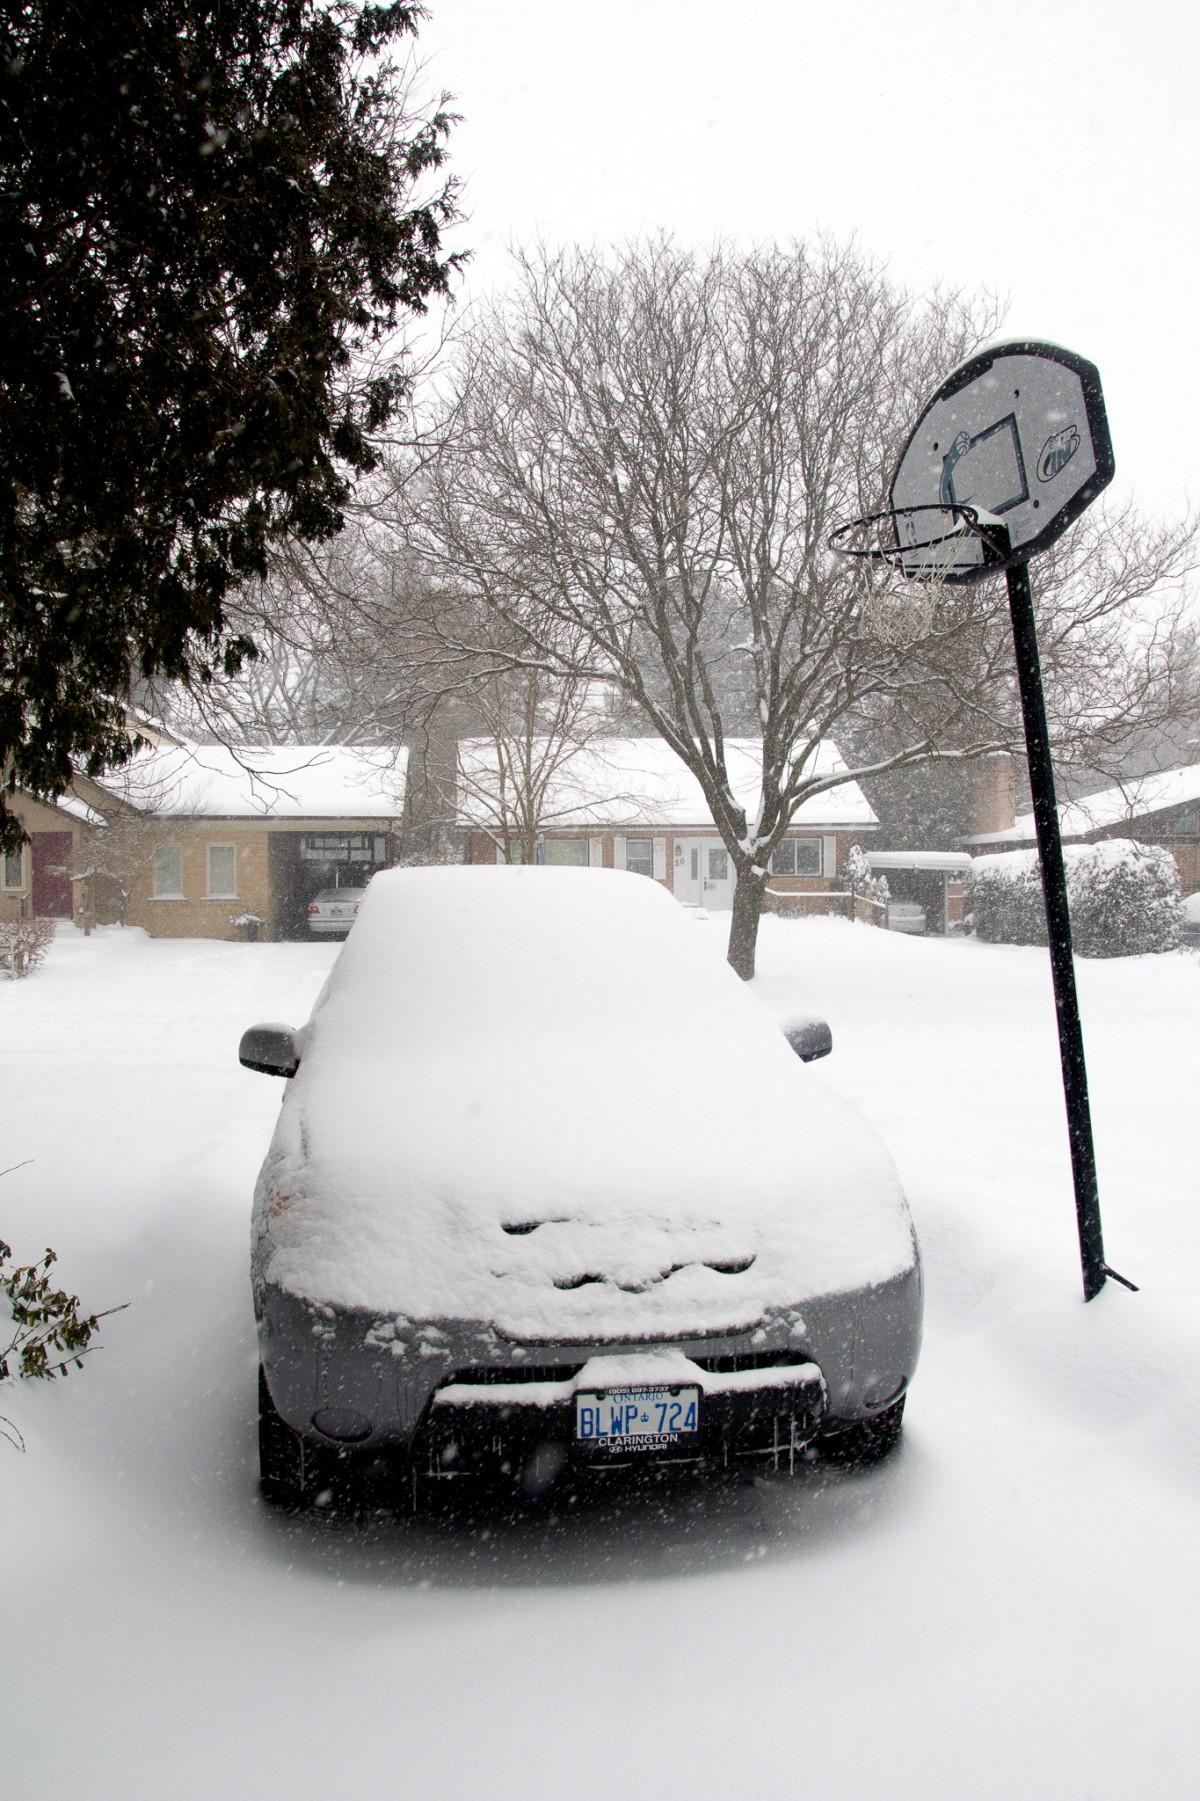 Snow Storm February 8, 2013